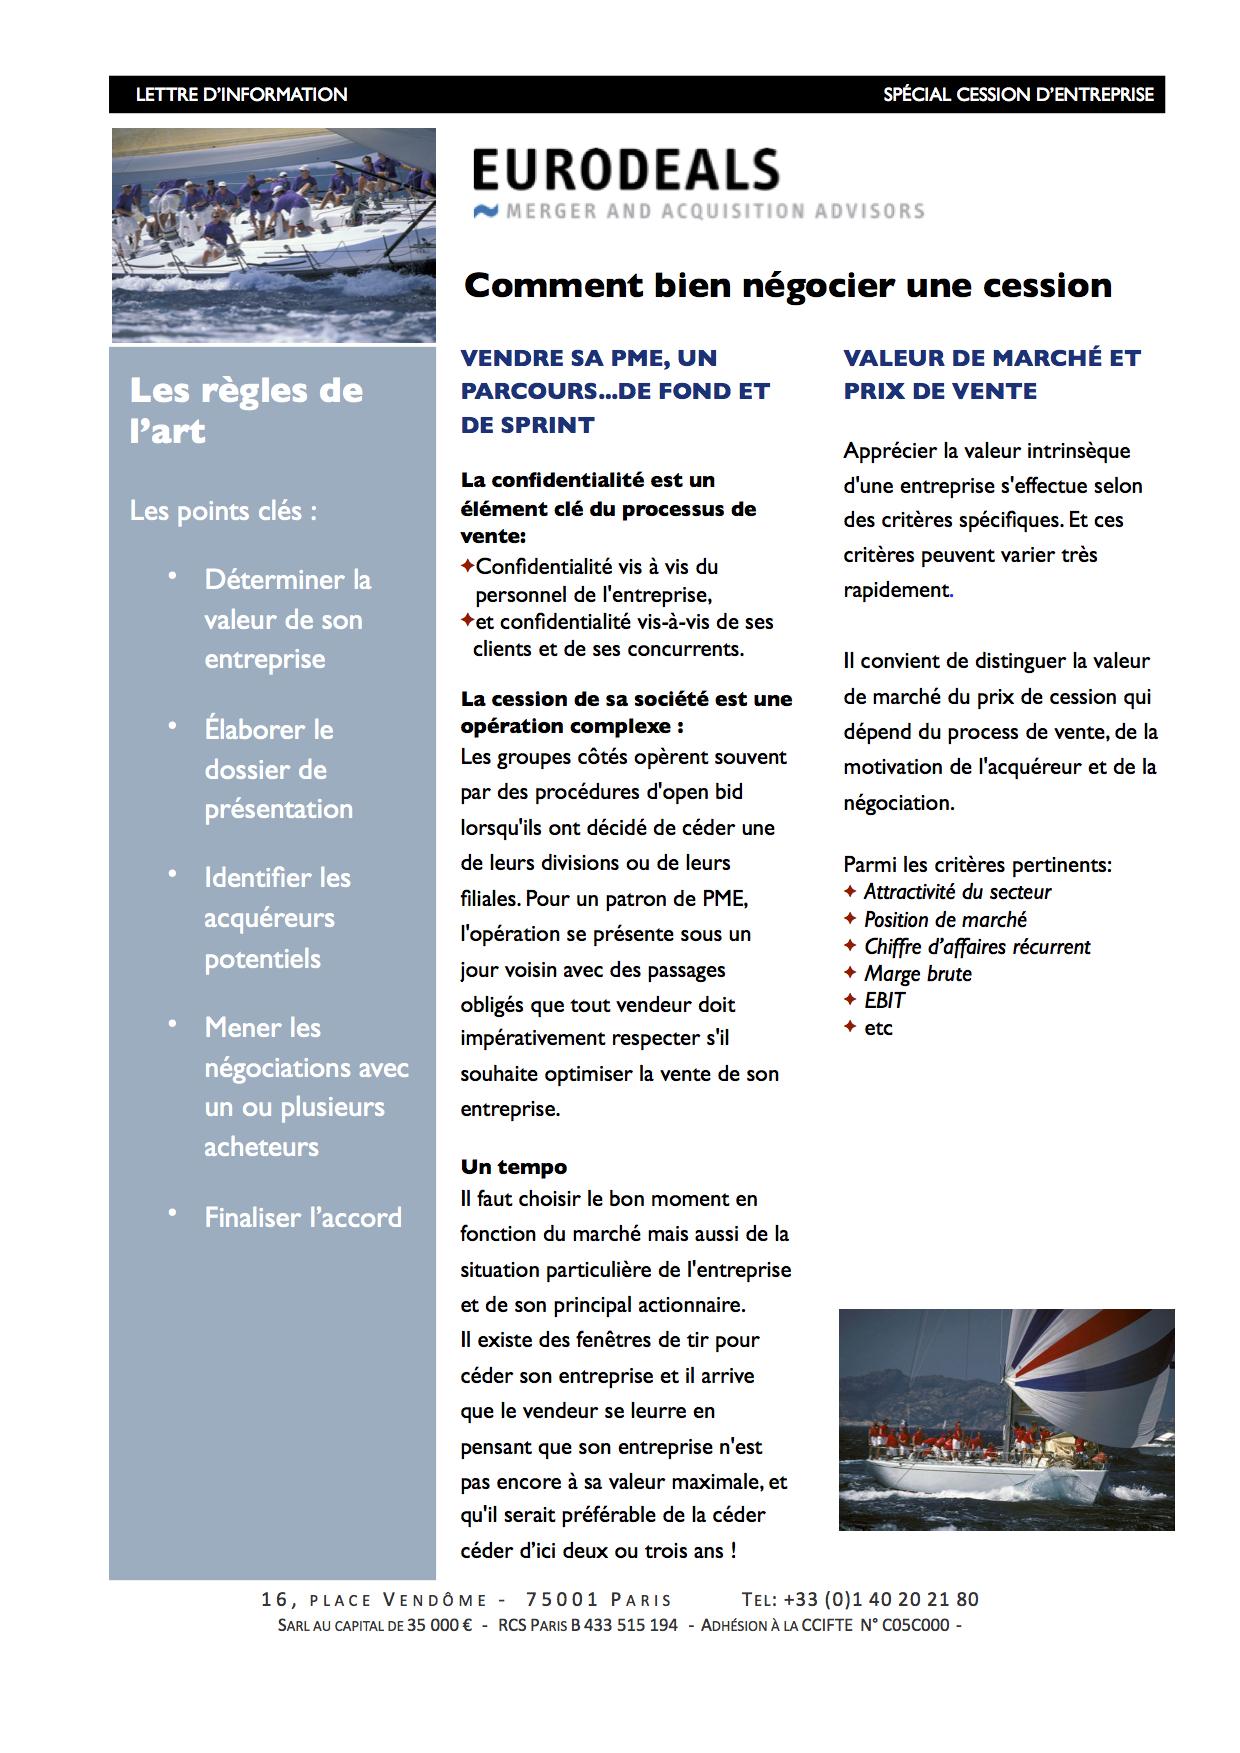 newsletter-eurodeals-comment-bien-ceder-son-entreprise-1